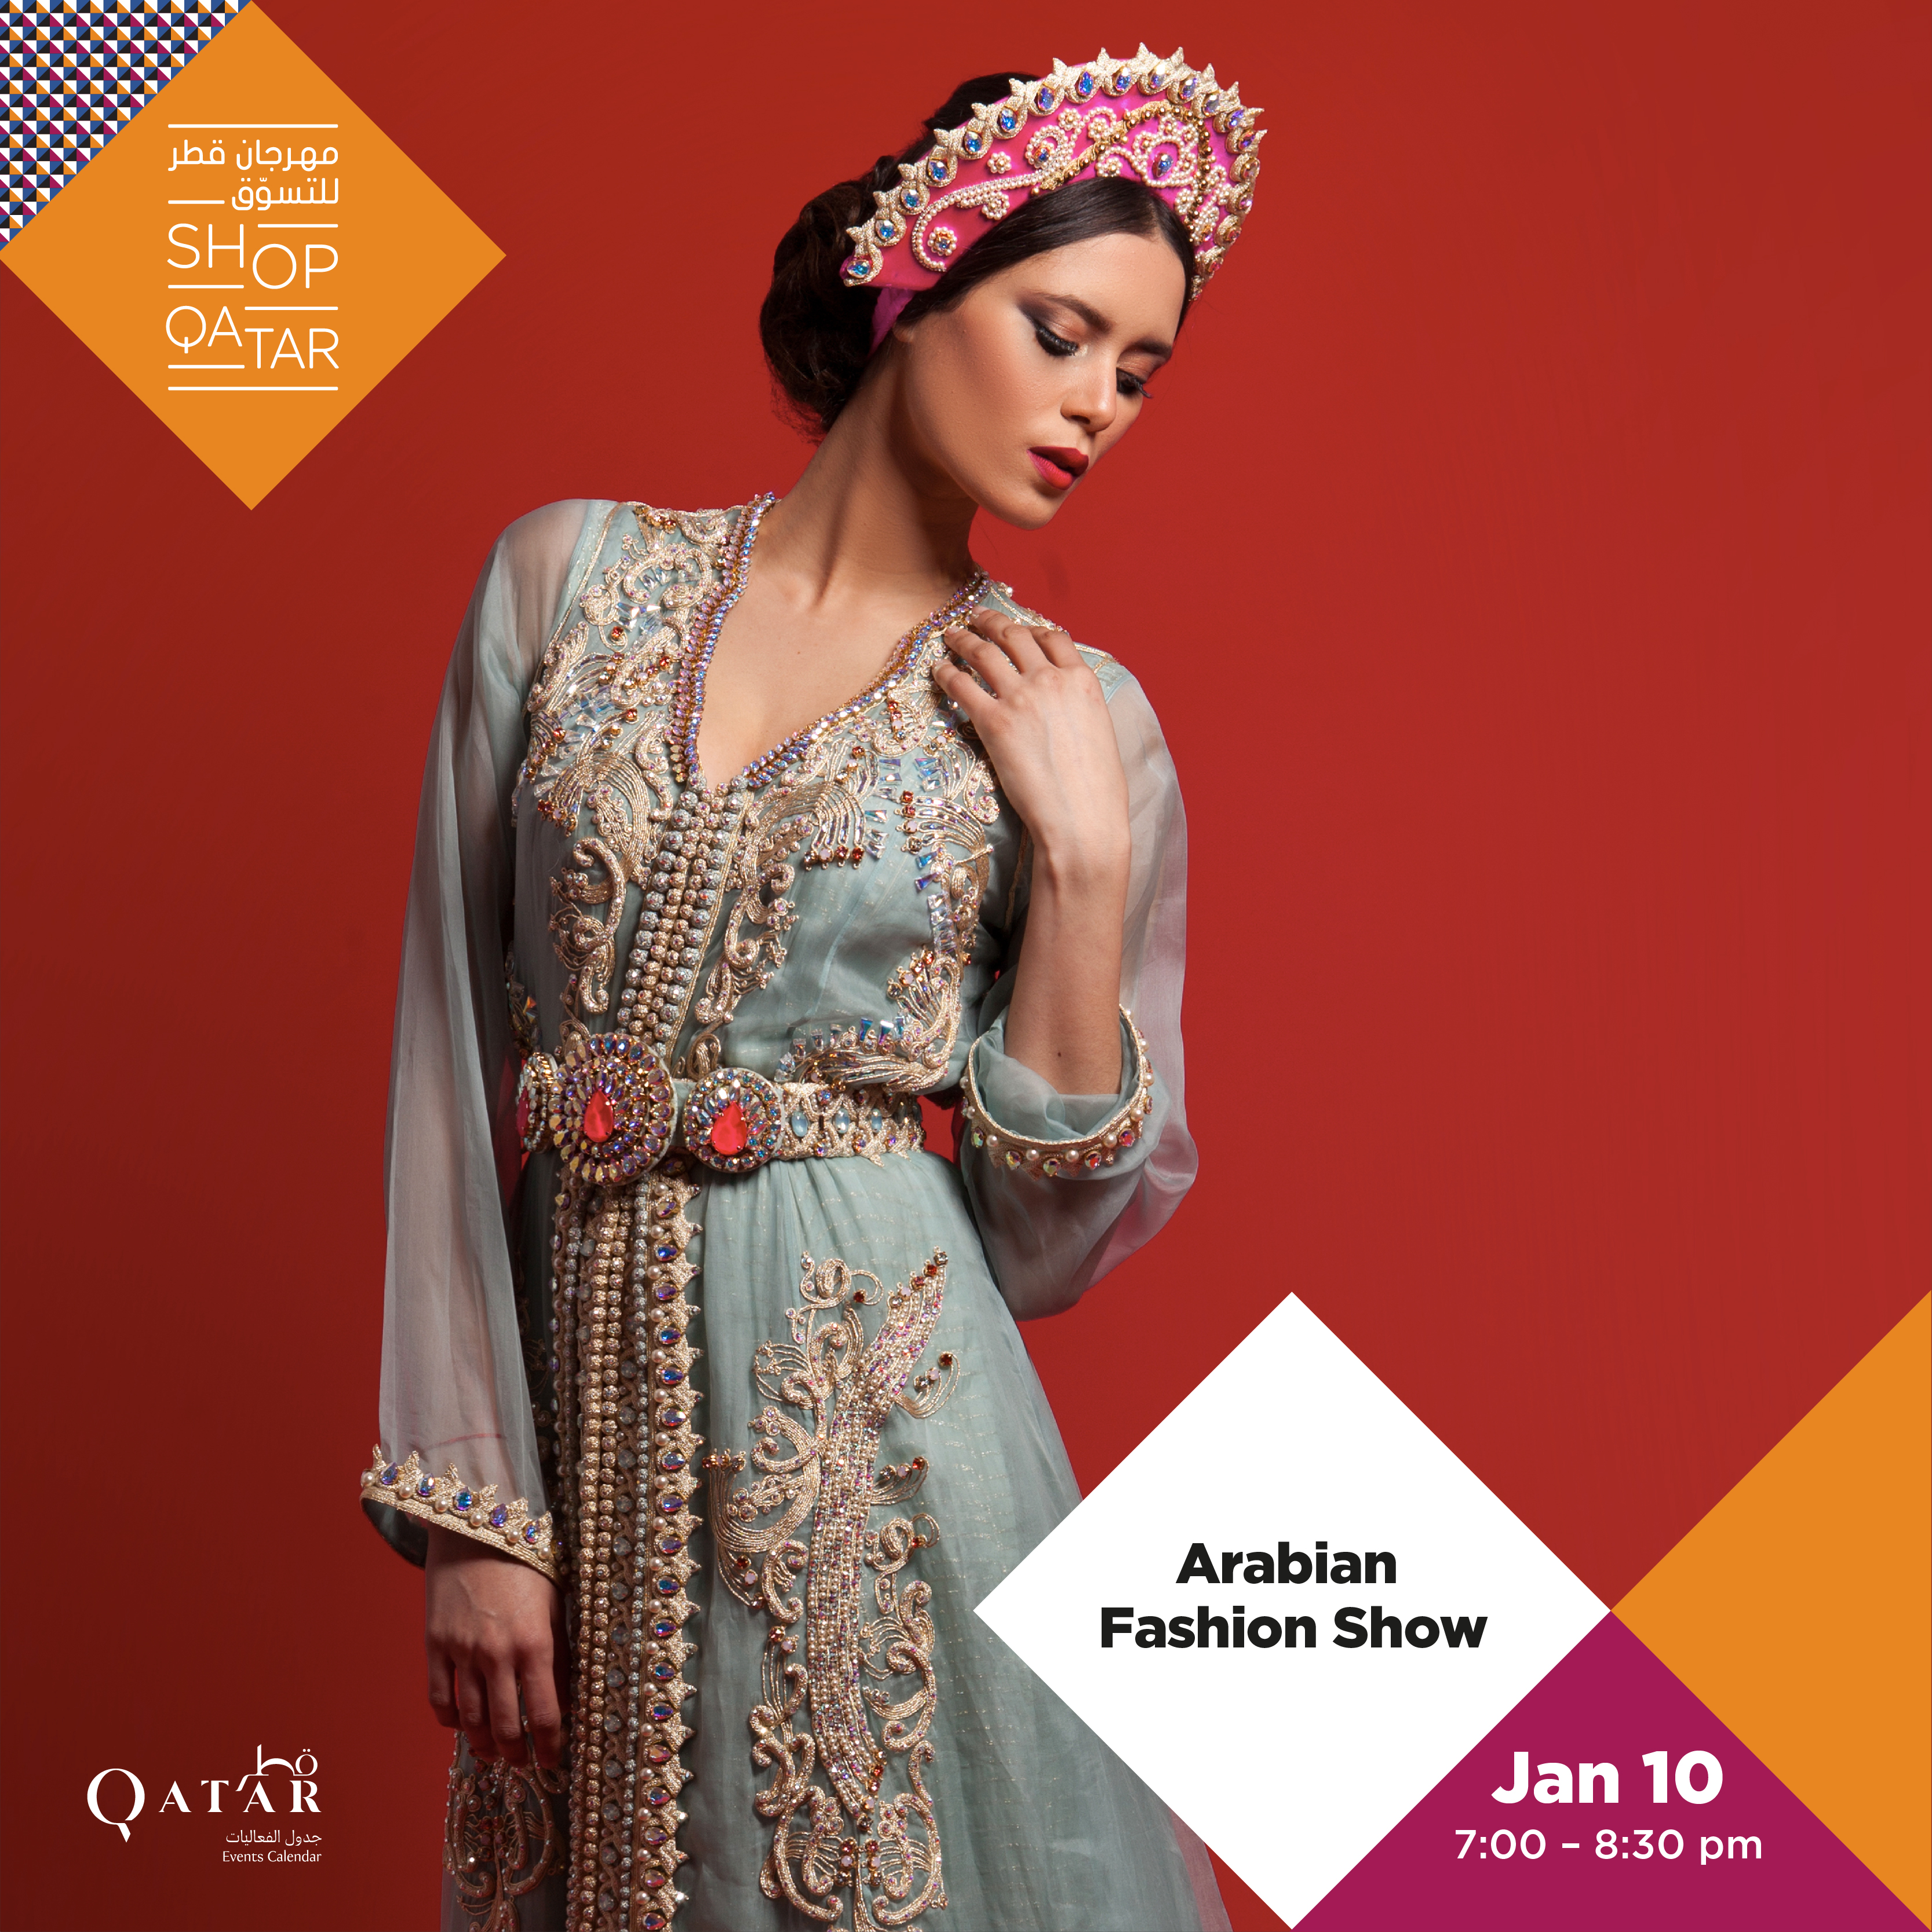 Arabian Fashion Show